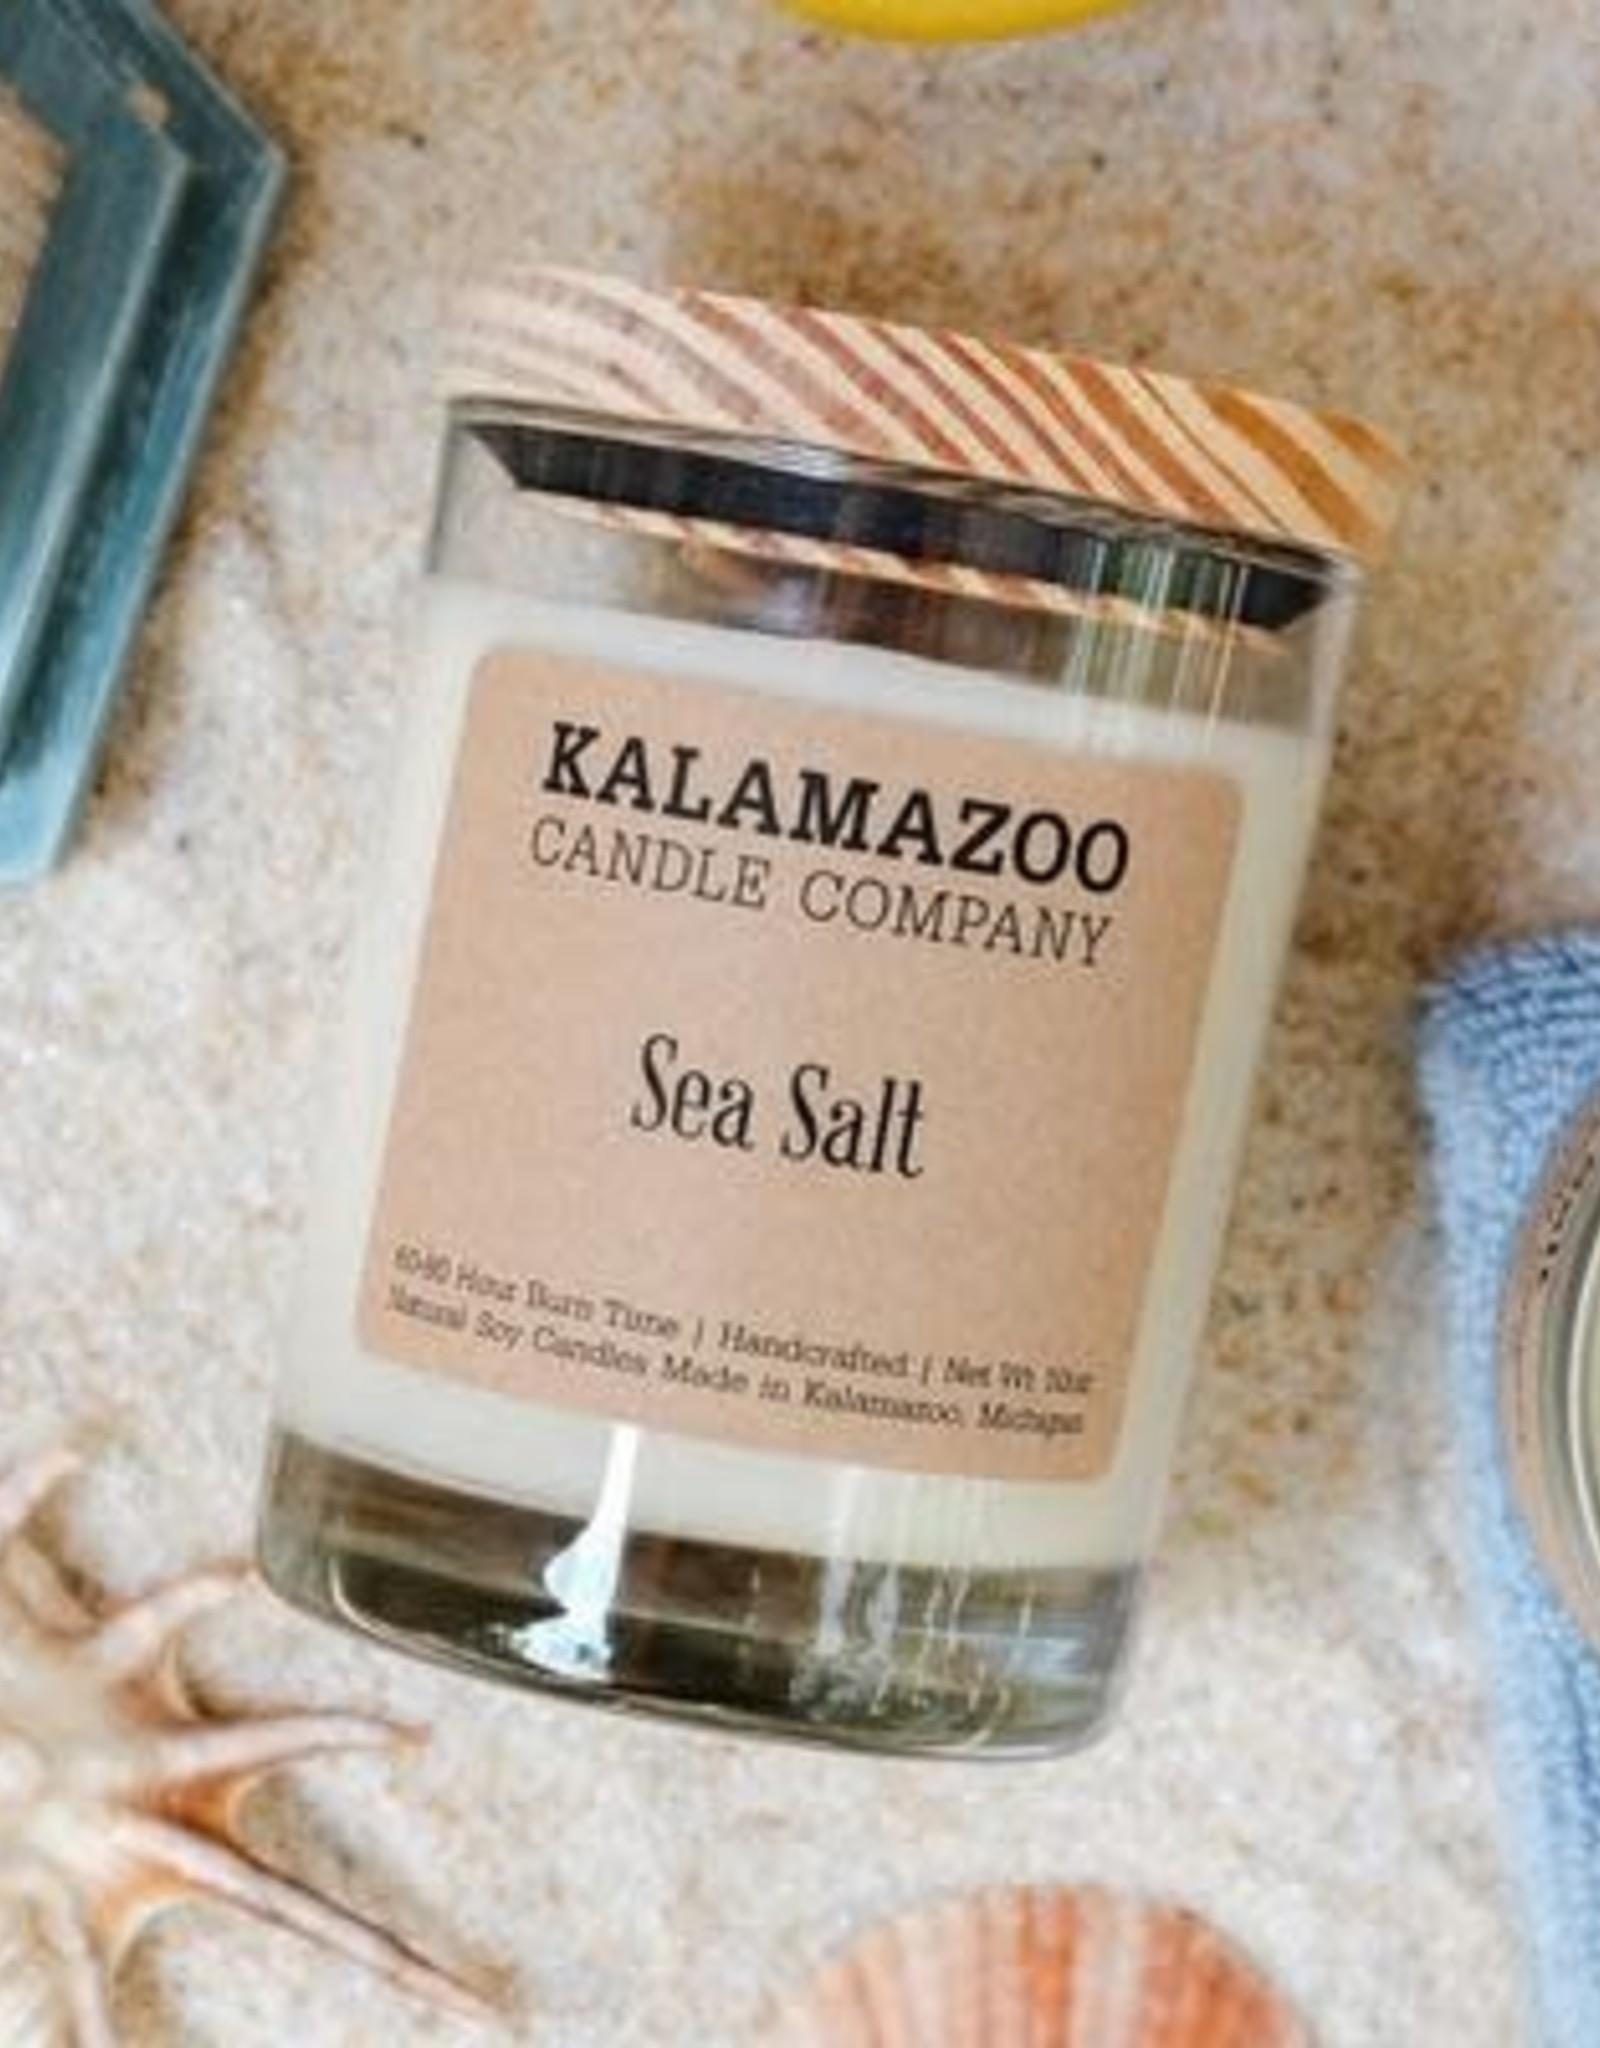 Kalamazoo Candle Co. Kalamazoo Candle Co. | Sea Salt